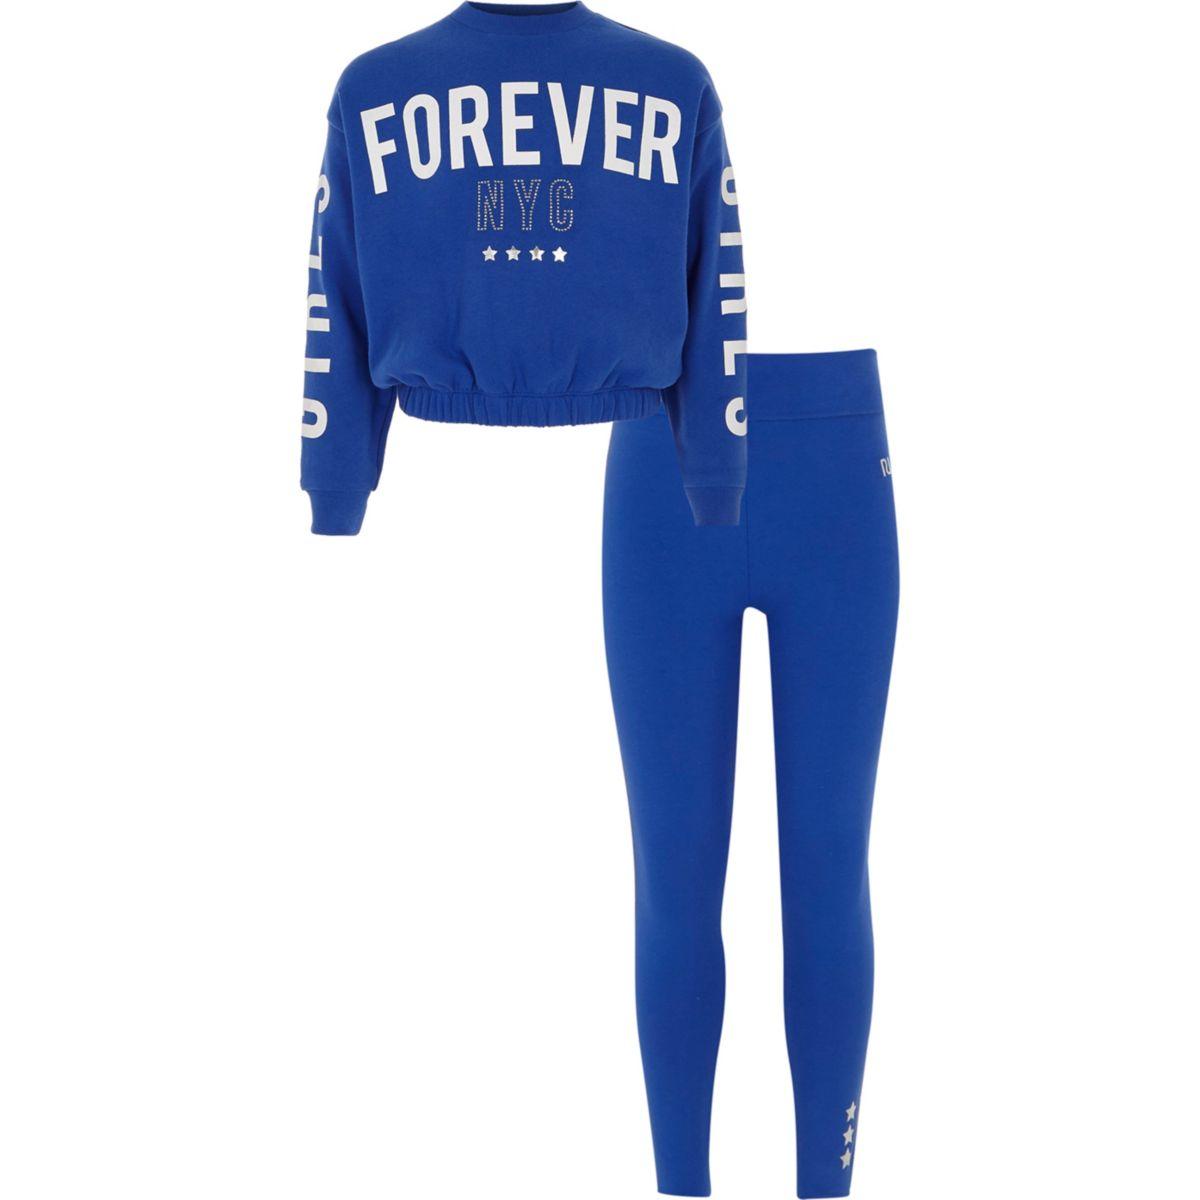 Ensemble sweat bleu « forever » pour fille